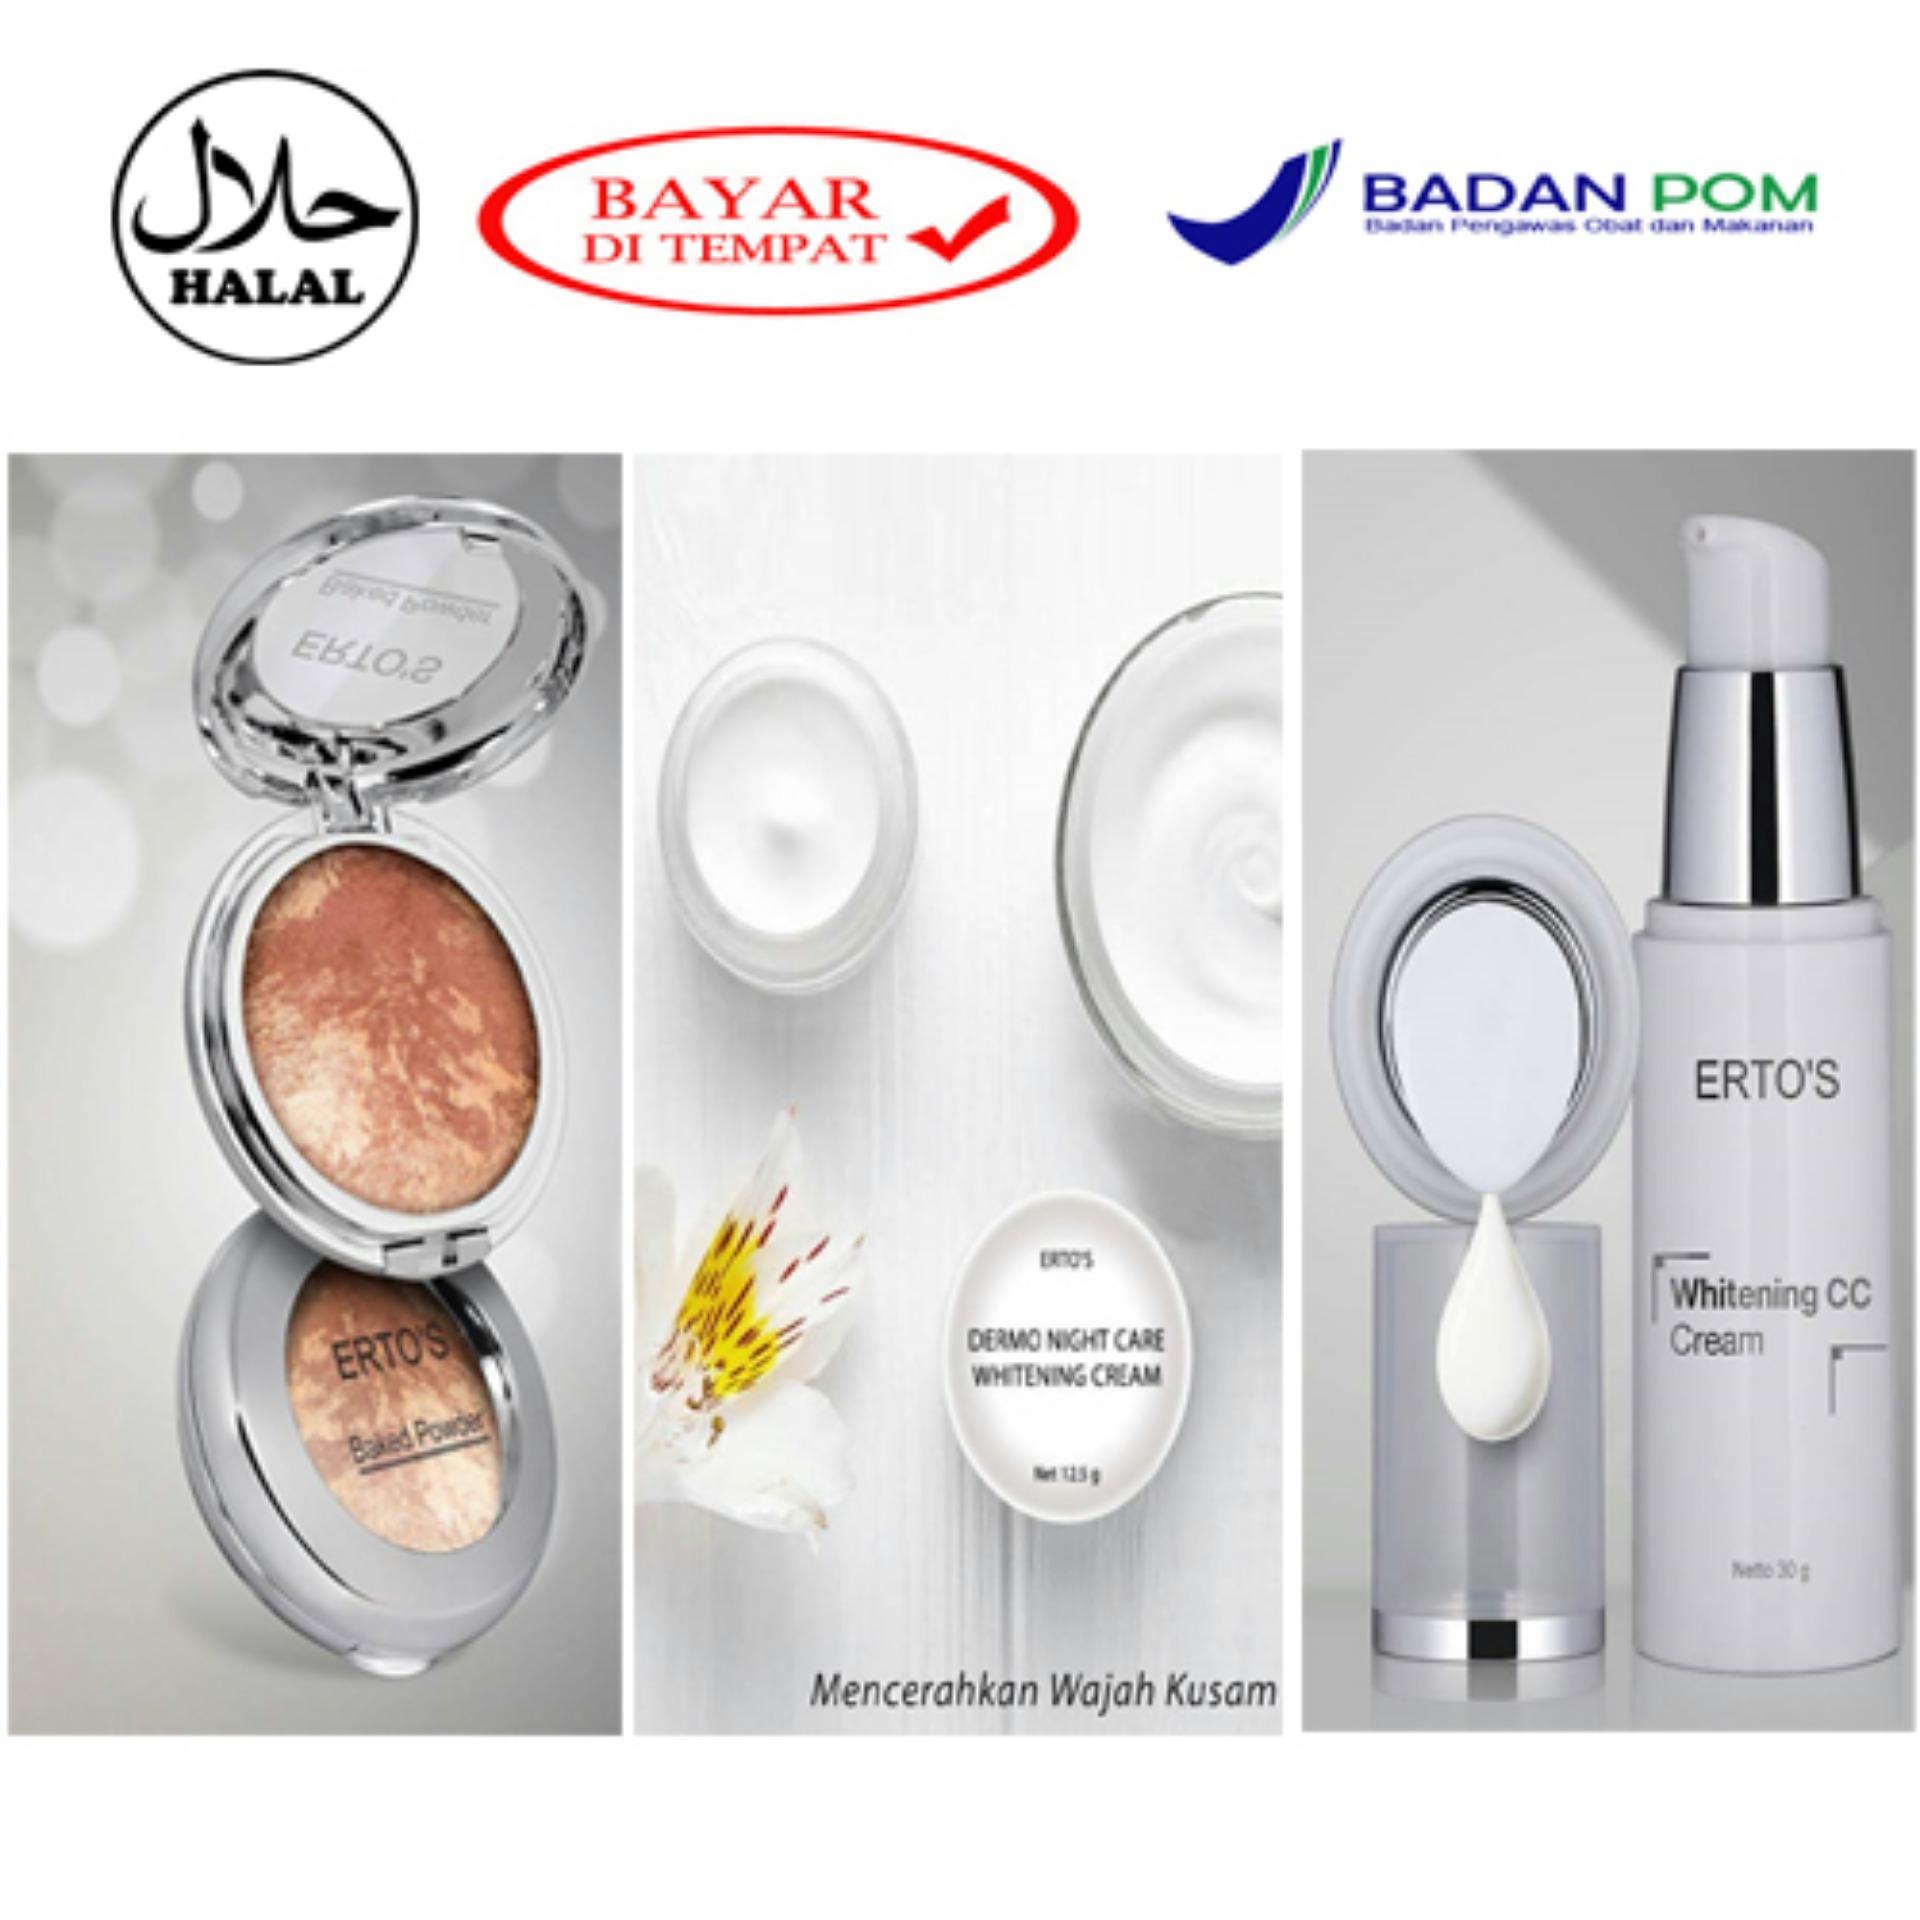 Ertos Paket Cc Cream Night Baked Powder Daftar Harga Hemat Kekinian Facial Treatment And Original Super Glowing